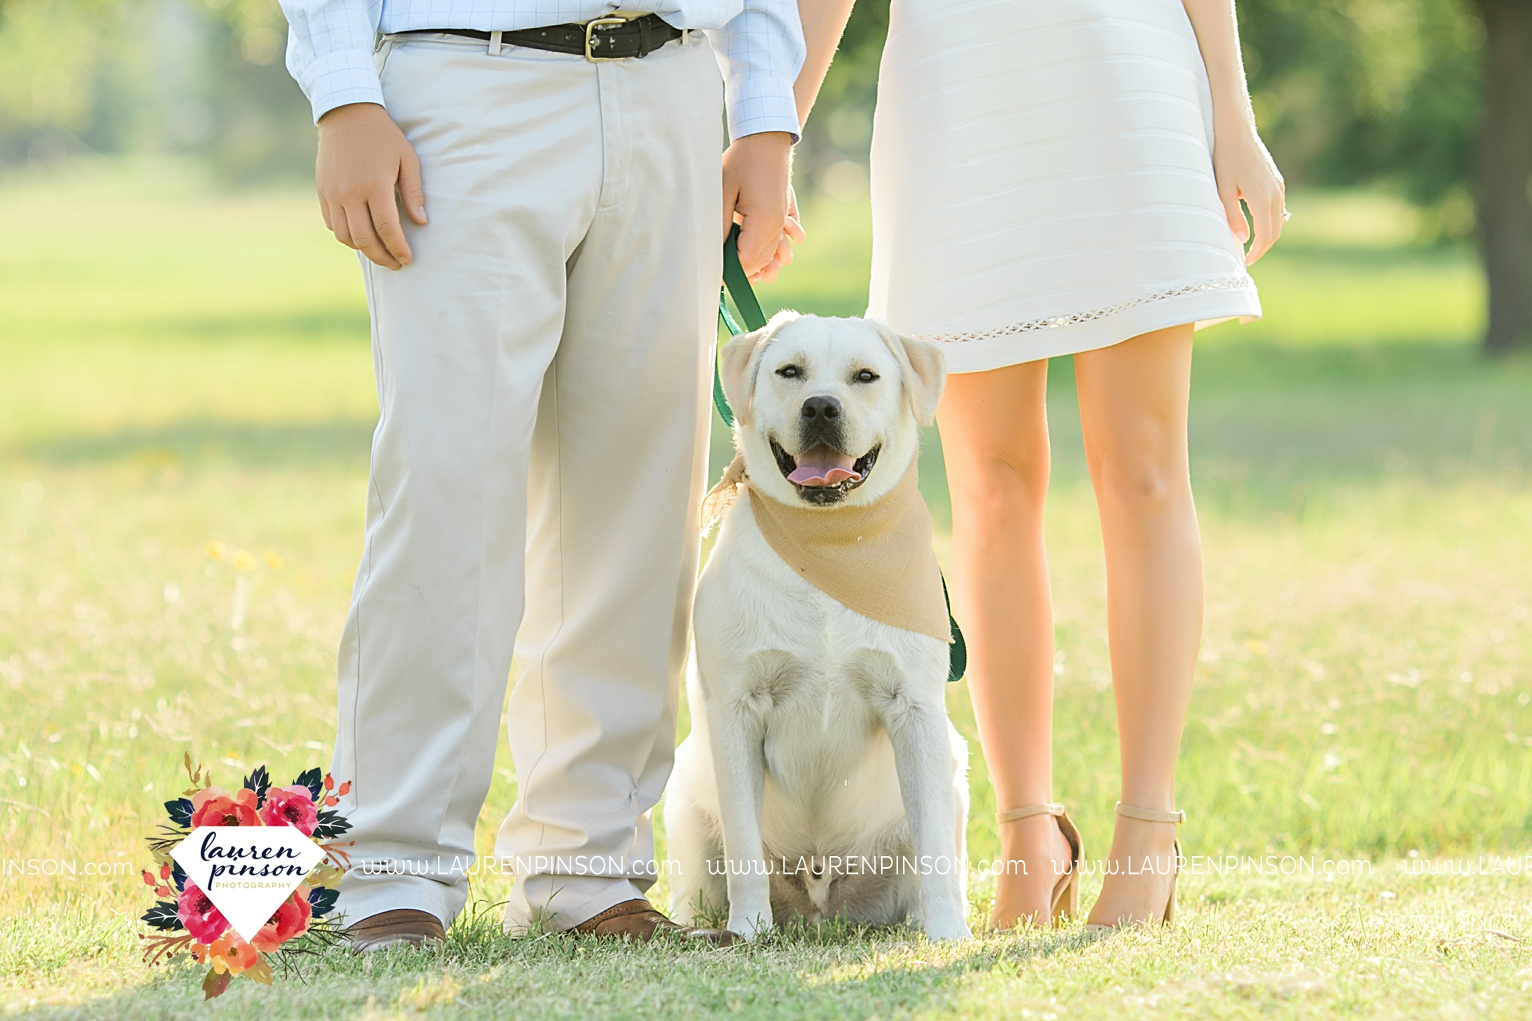 wichita-falls-texas-wedding-photographer-beachy-engagement-session-at-lake-wichita_2919.jpg